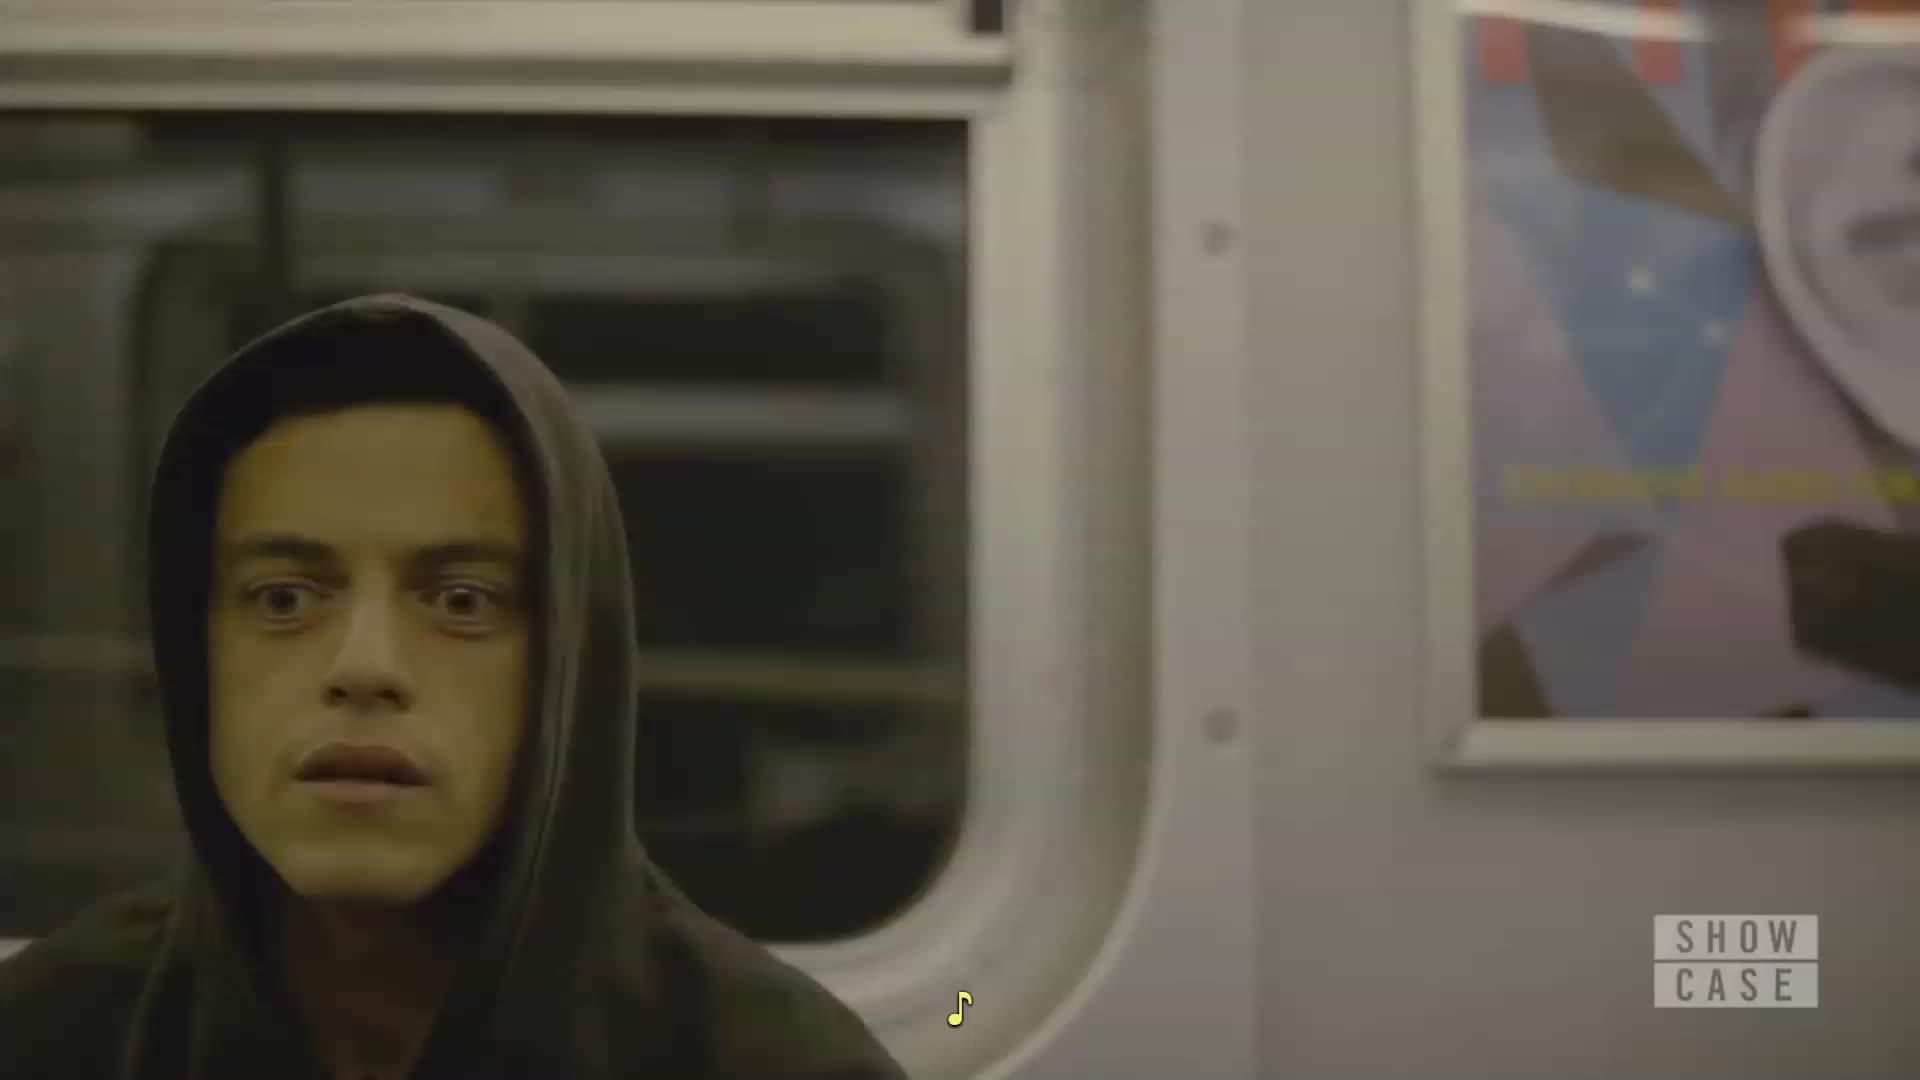 Rami Malek, mrrobot, mrrobotlounge, 3 reactions? GIFs